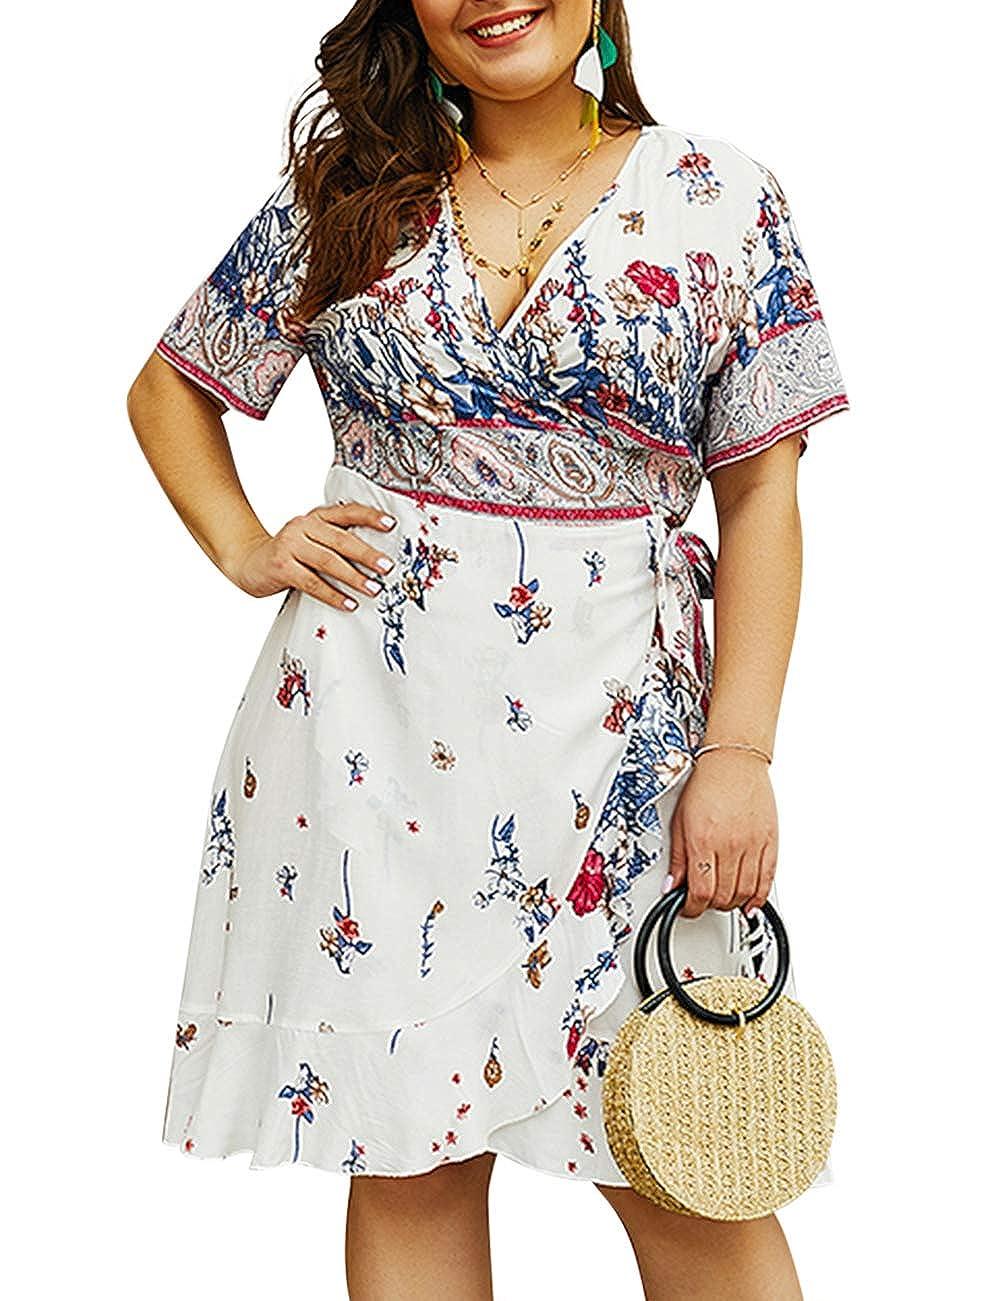 White YUMDO Women's Short Sleeve Floral Print T Shirt Vintage Blouse Top Asymmetric Hem